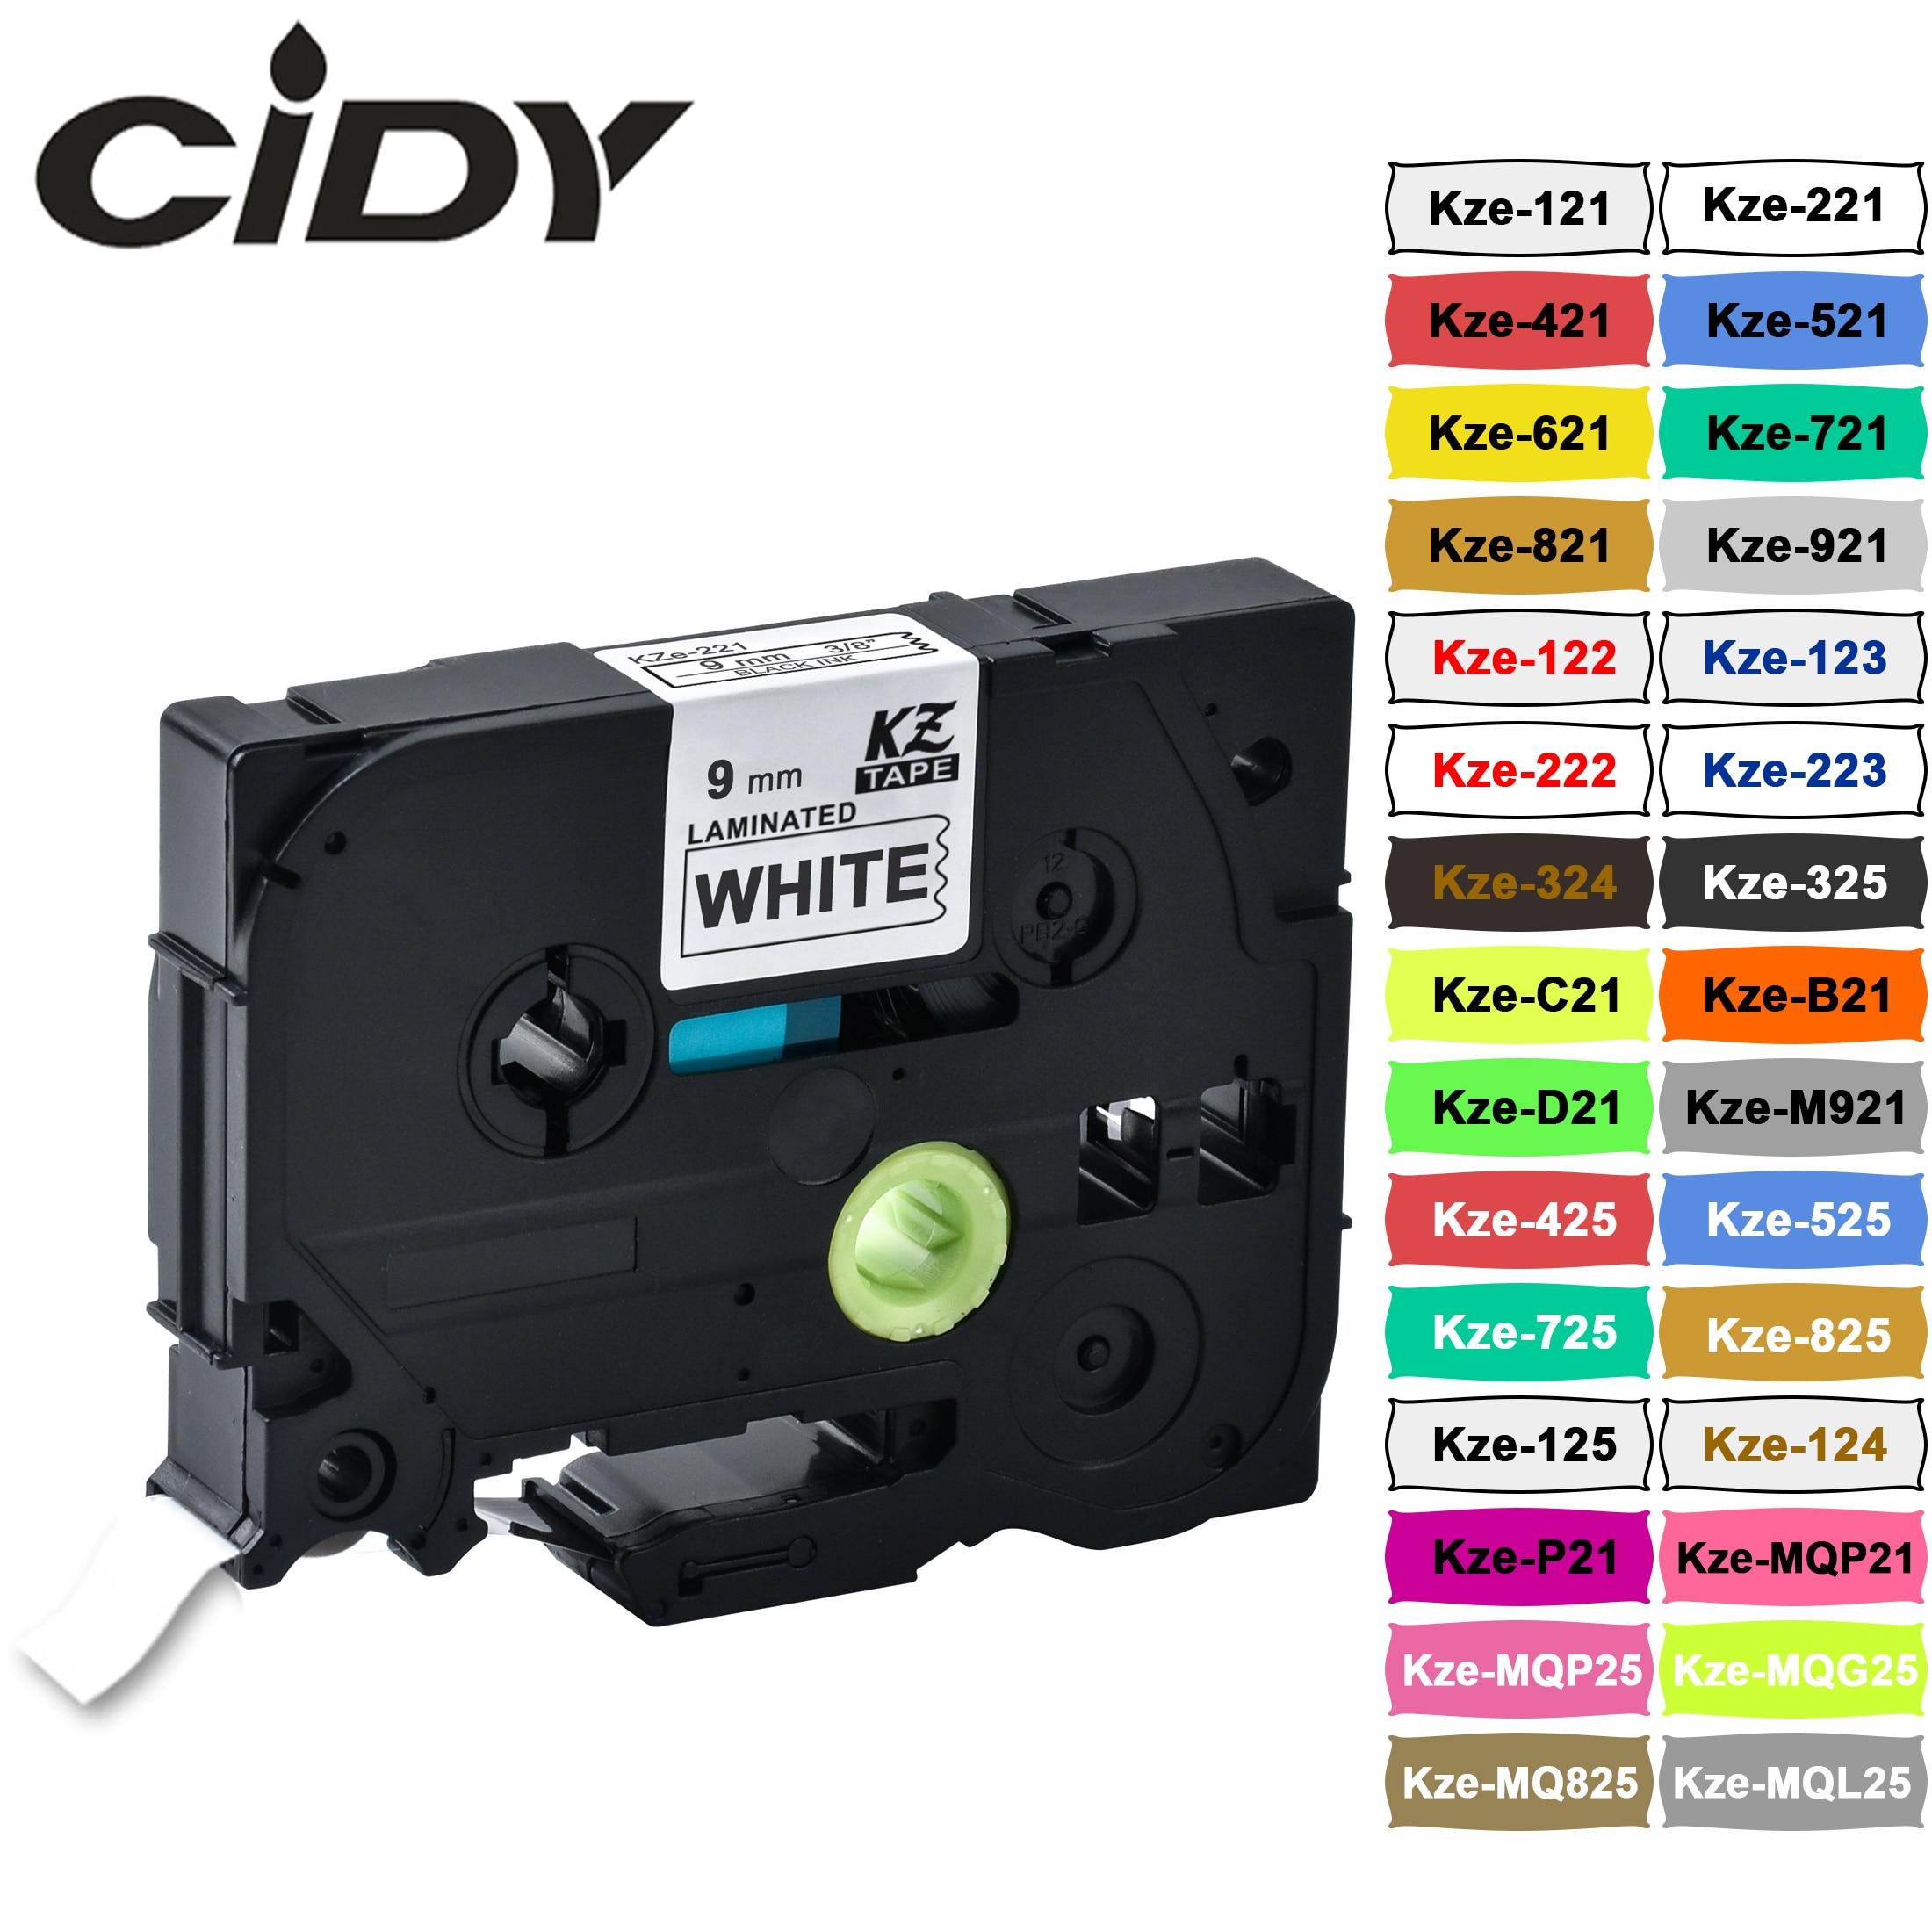 CIDY tze221 9mm Compatible con laminado tze 221 negro sobre blanco cinta de etiquetas tze-221 tz-221 para impresora brother p-touch tze-121